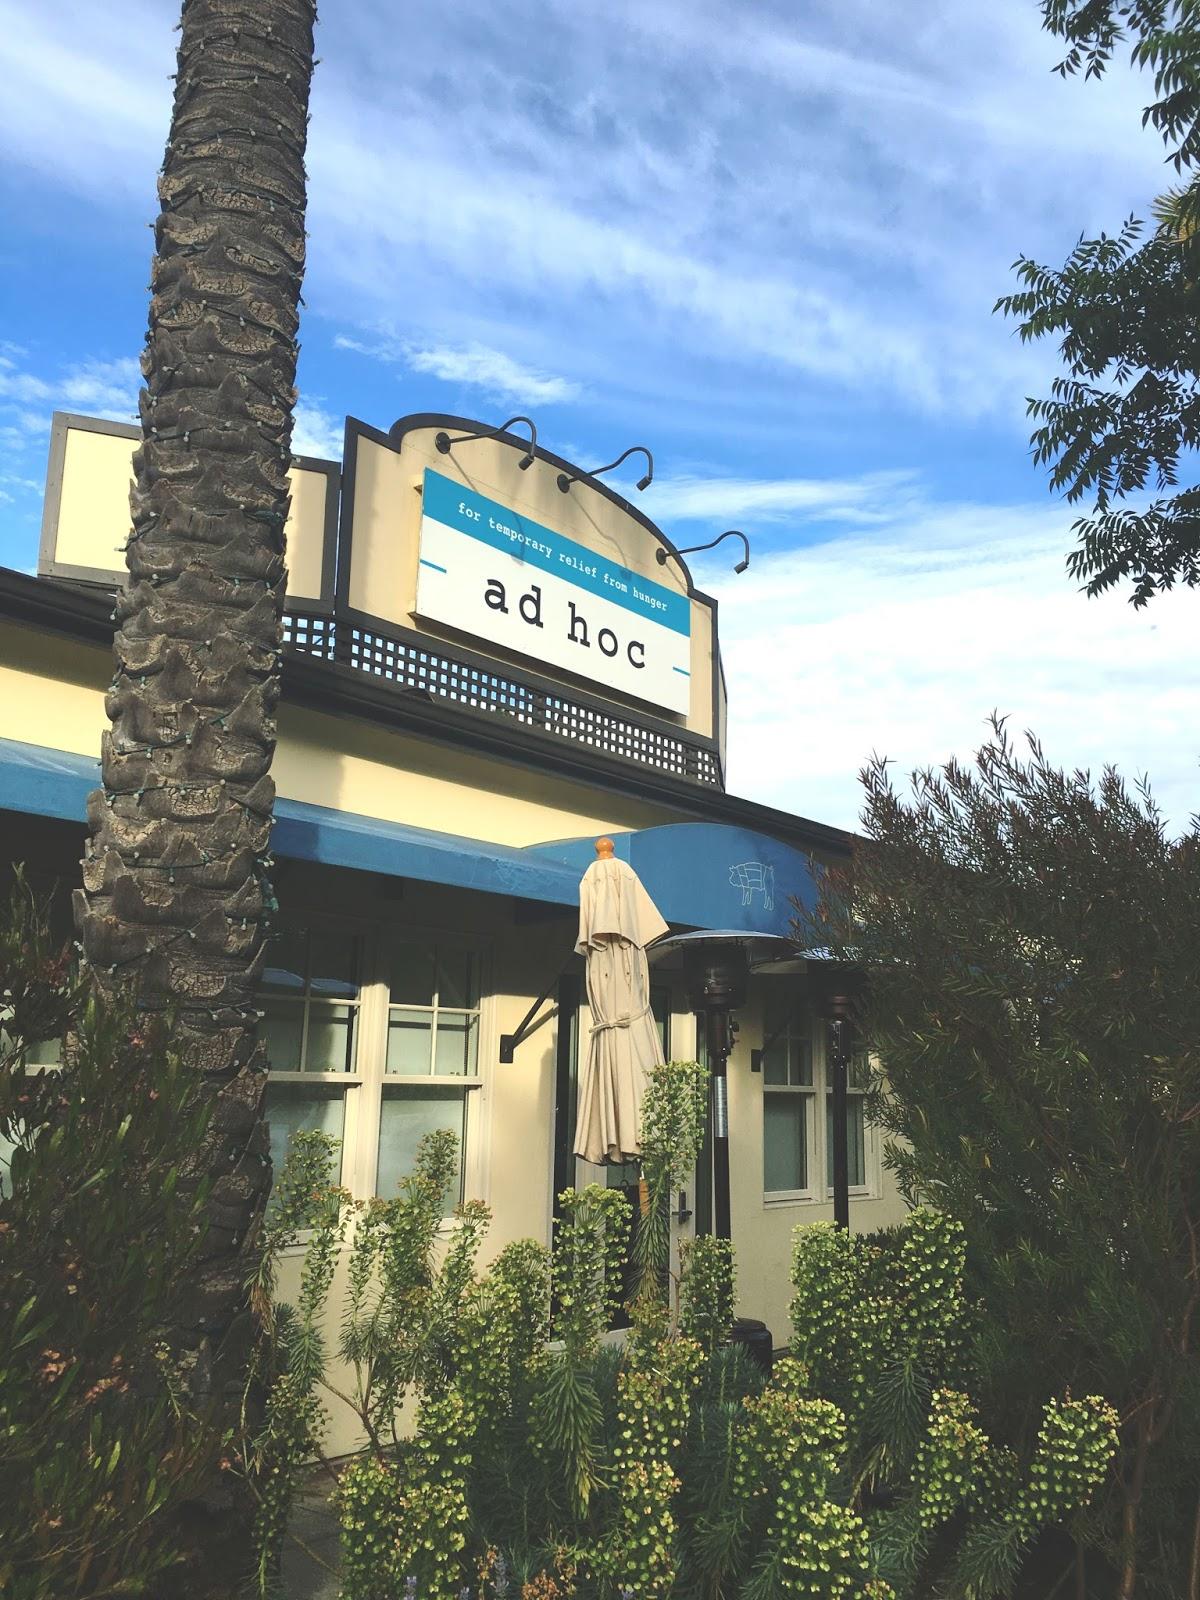 Ad Hoc - a restaurant in Napa, California